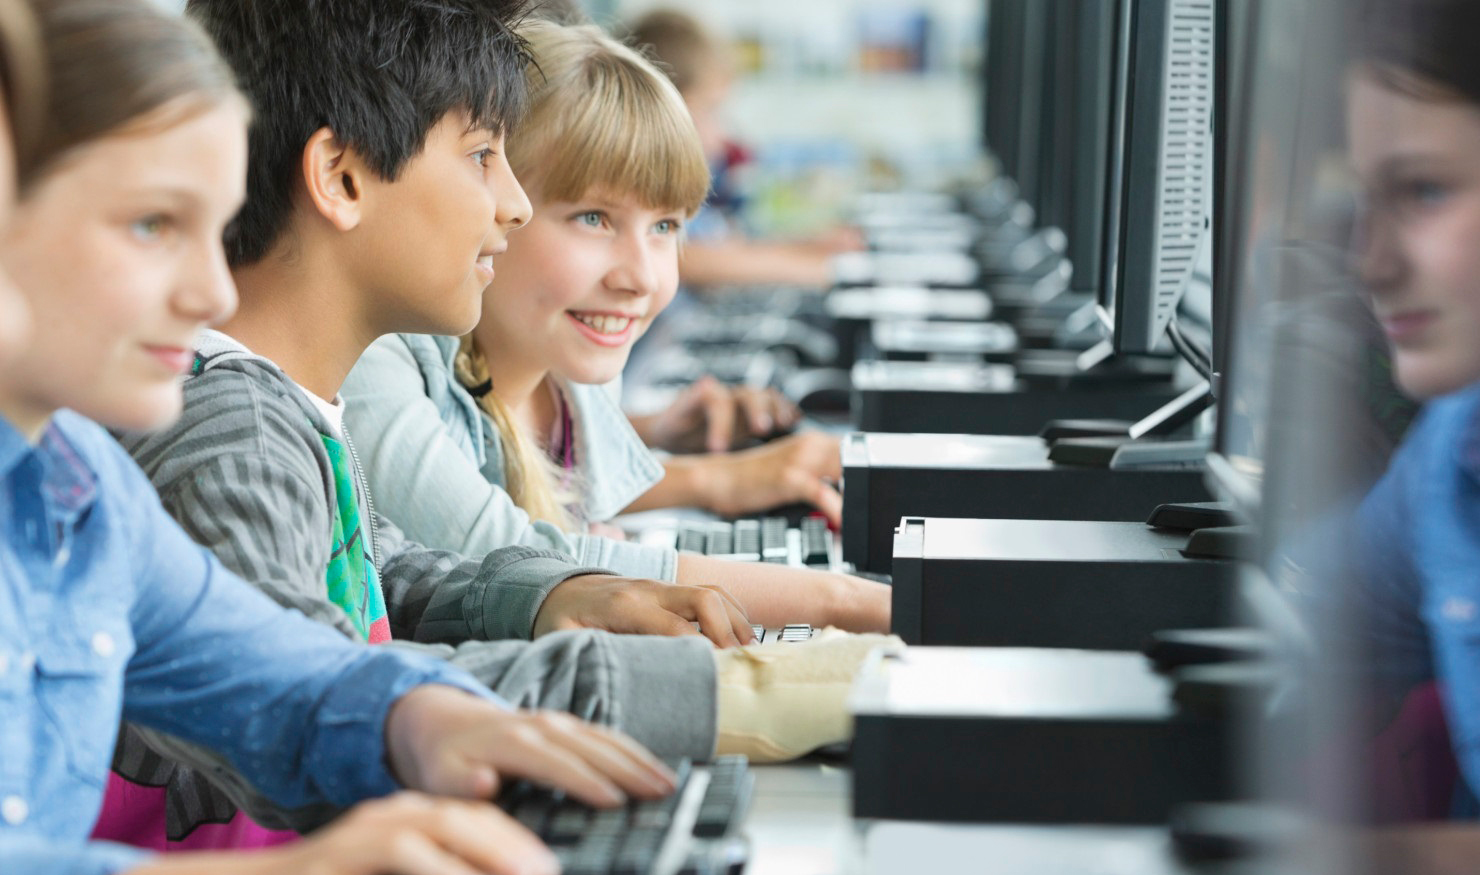 Estudiantes usando ordenadores